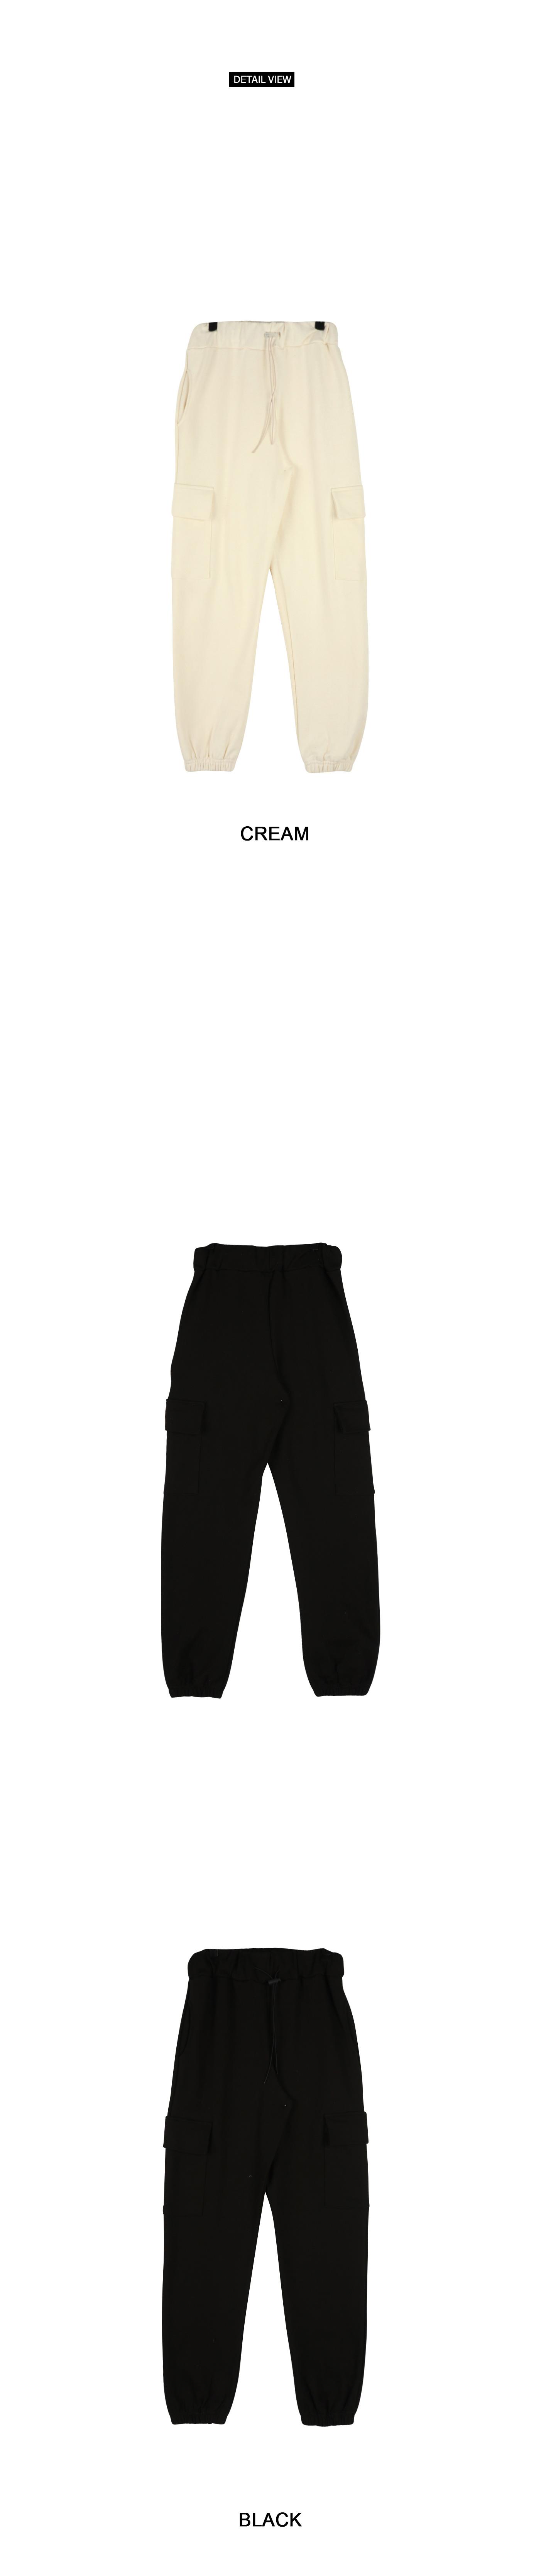 Peter Pocket Jogger Pants